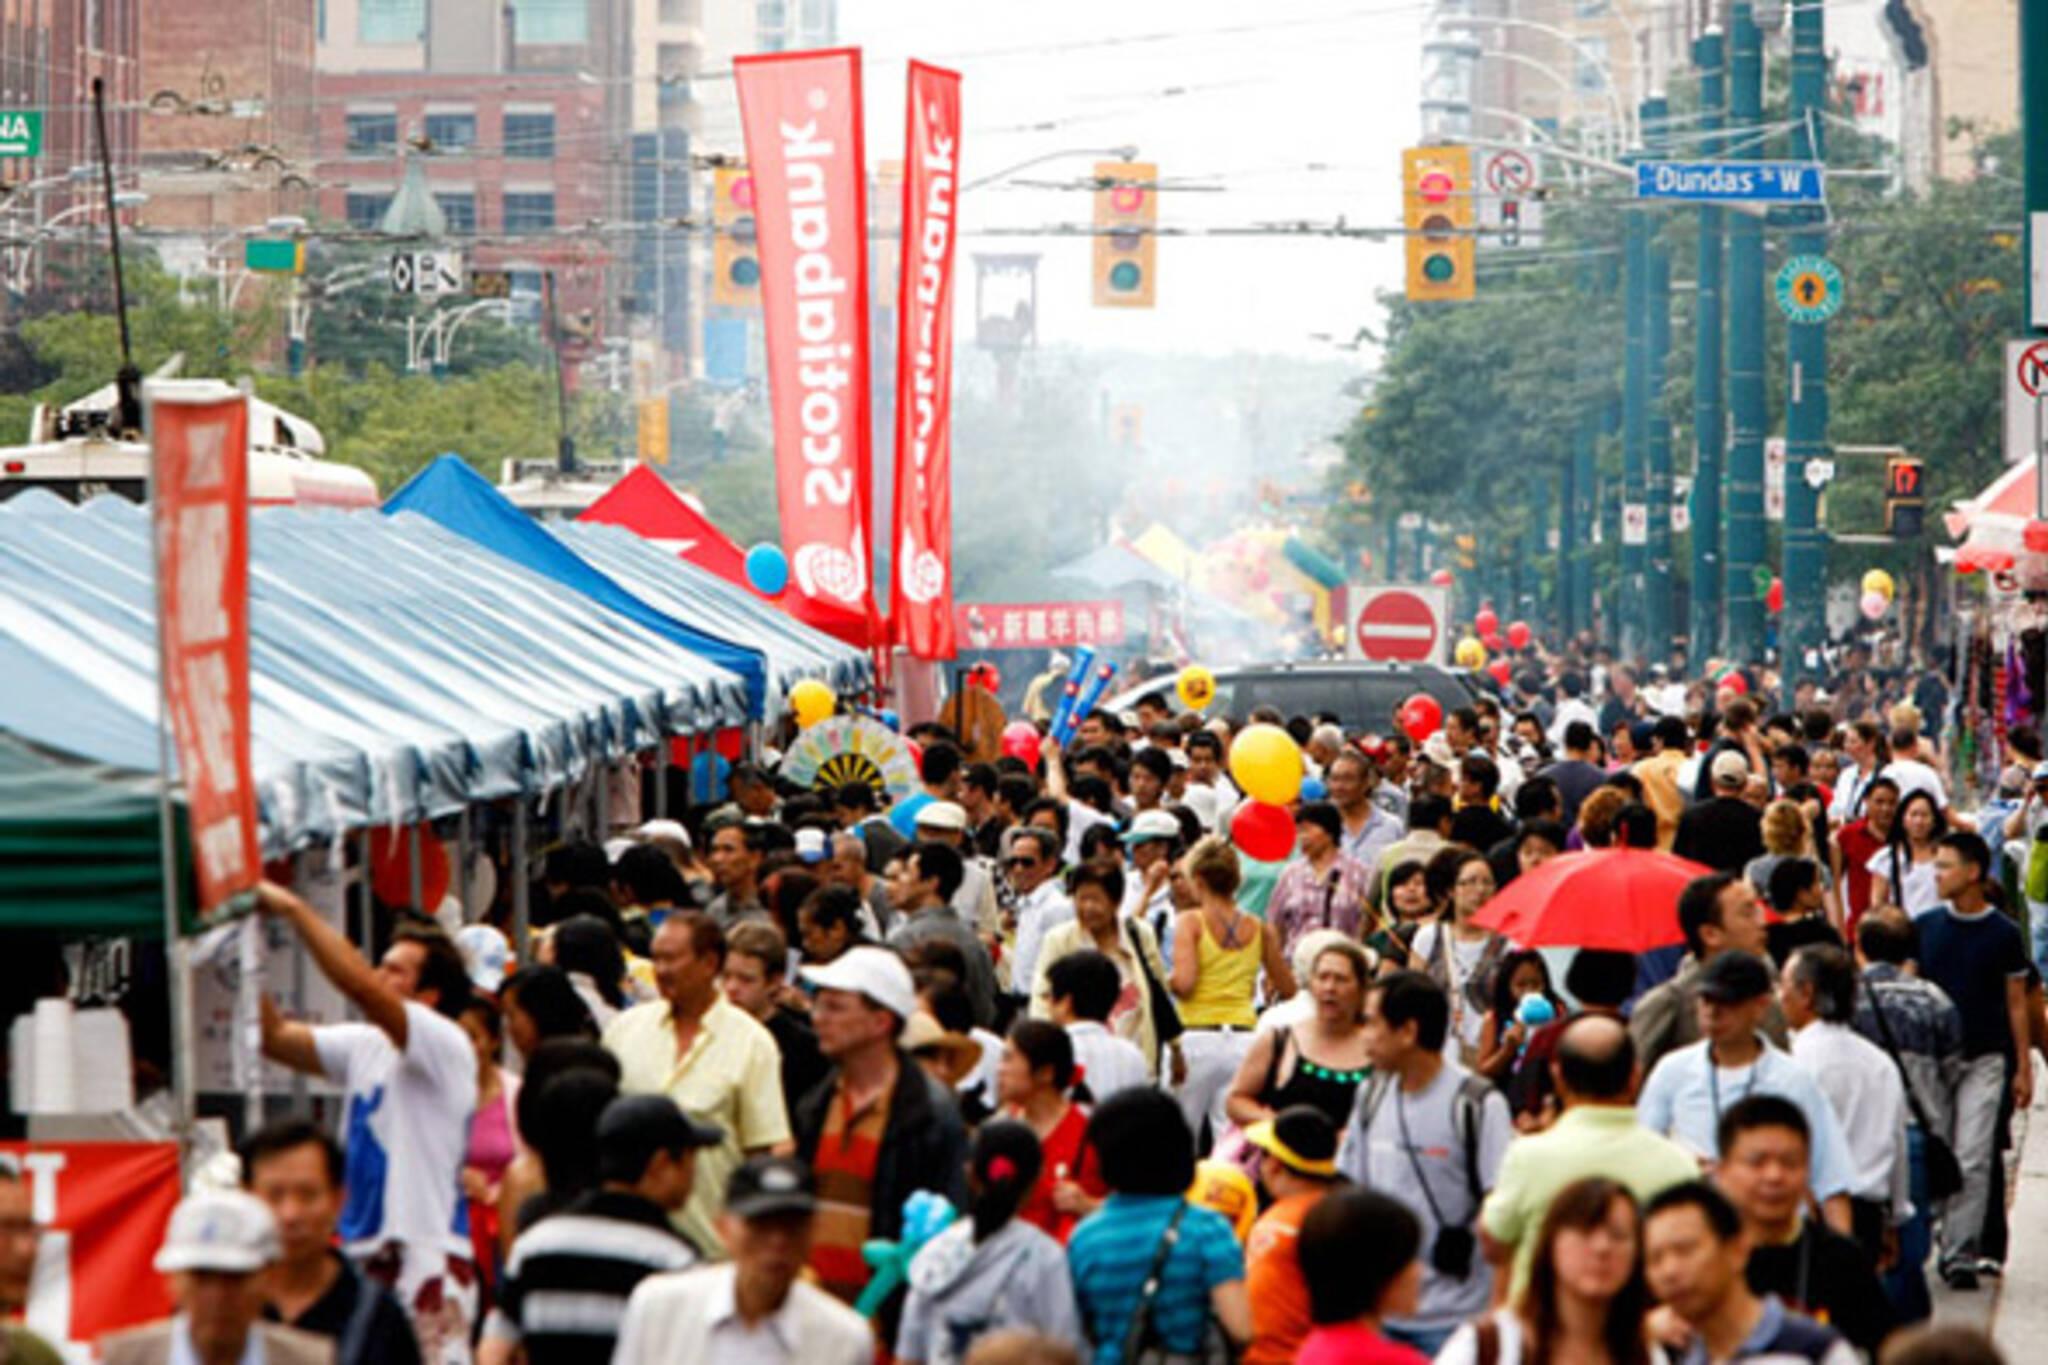 Toronto events night market